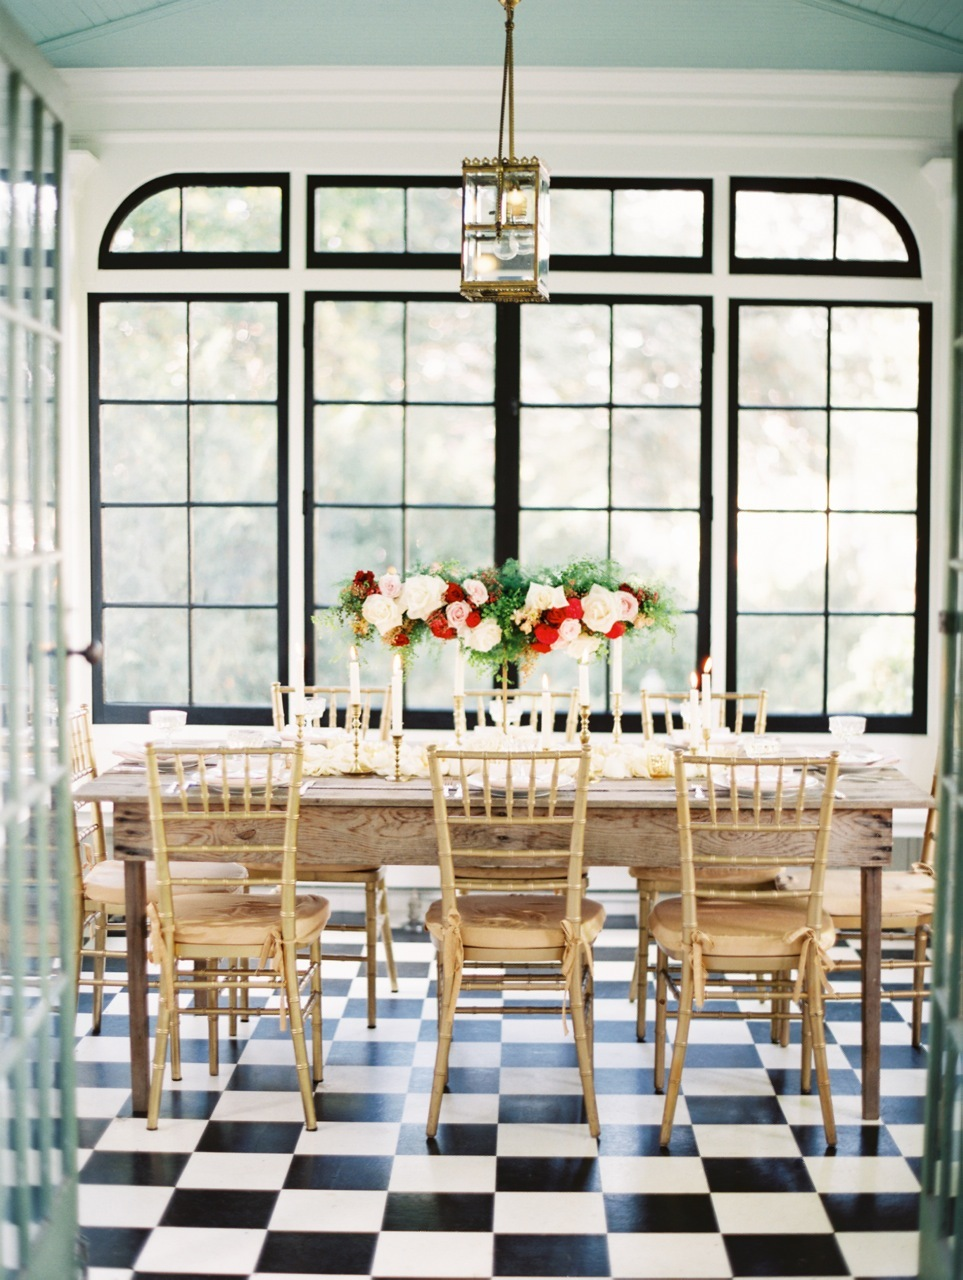 Reception, Flowers & Decor, red, gold, Chiavari, Romantic, Elegant, Chair, Checkered, Décor, Love poems styled wedding